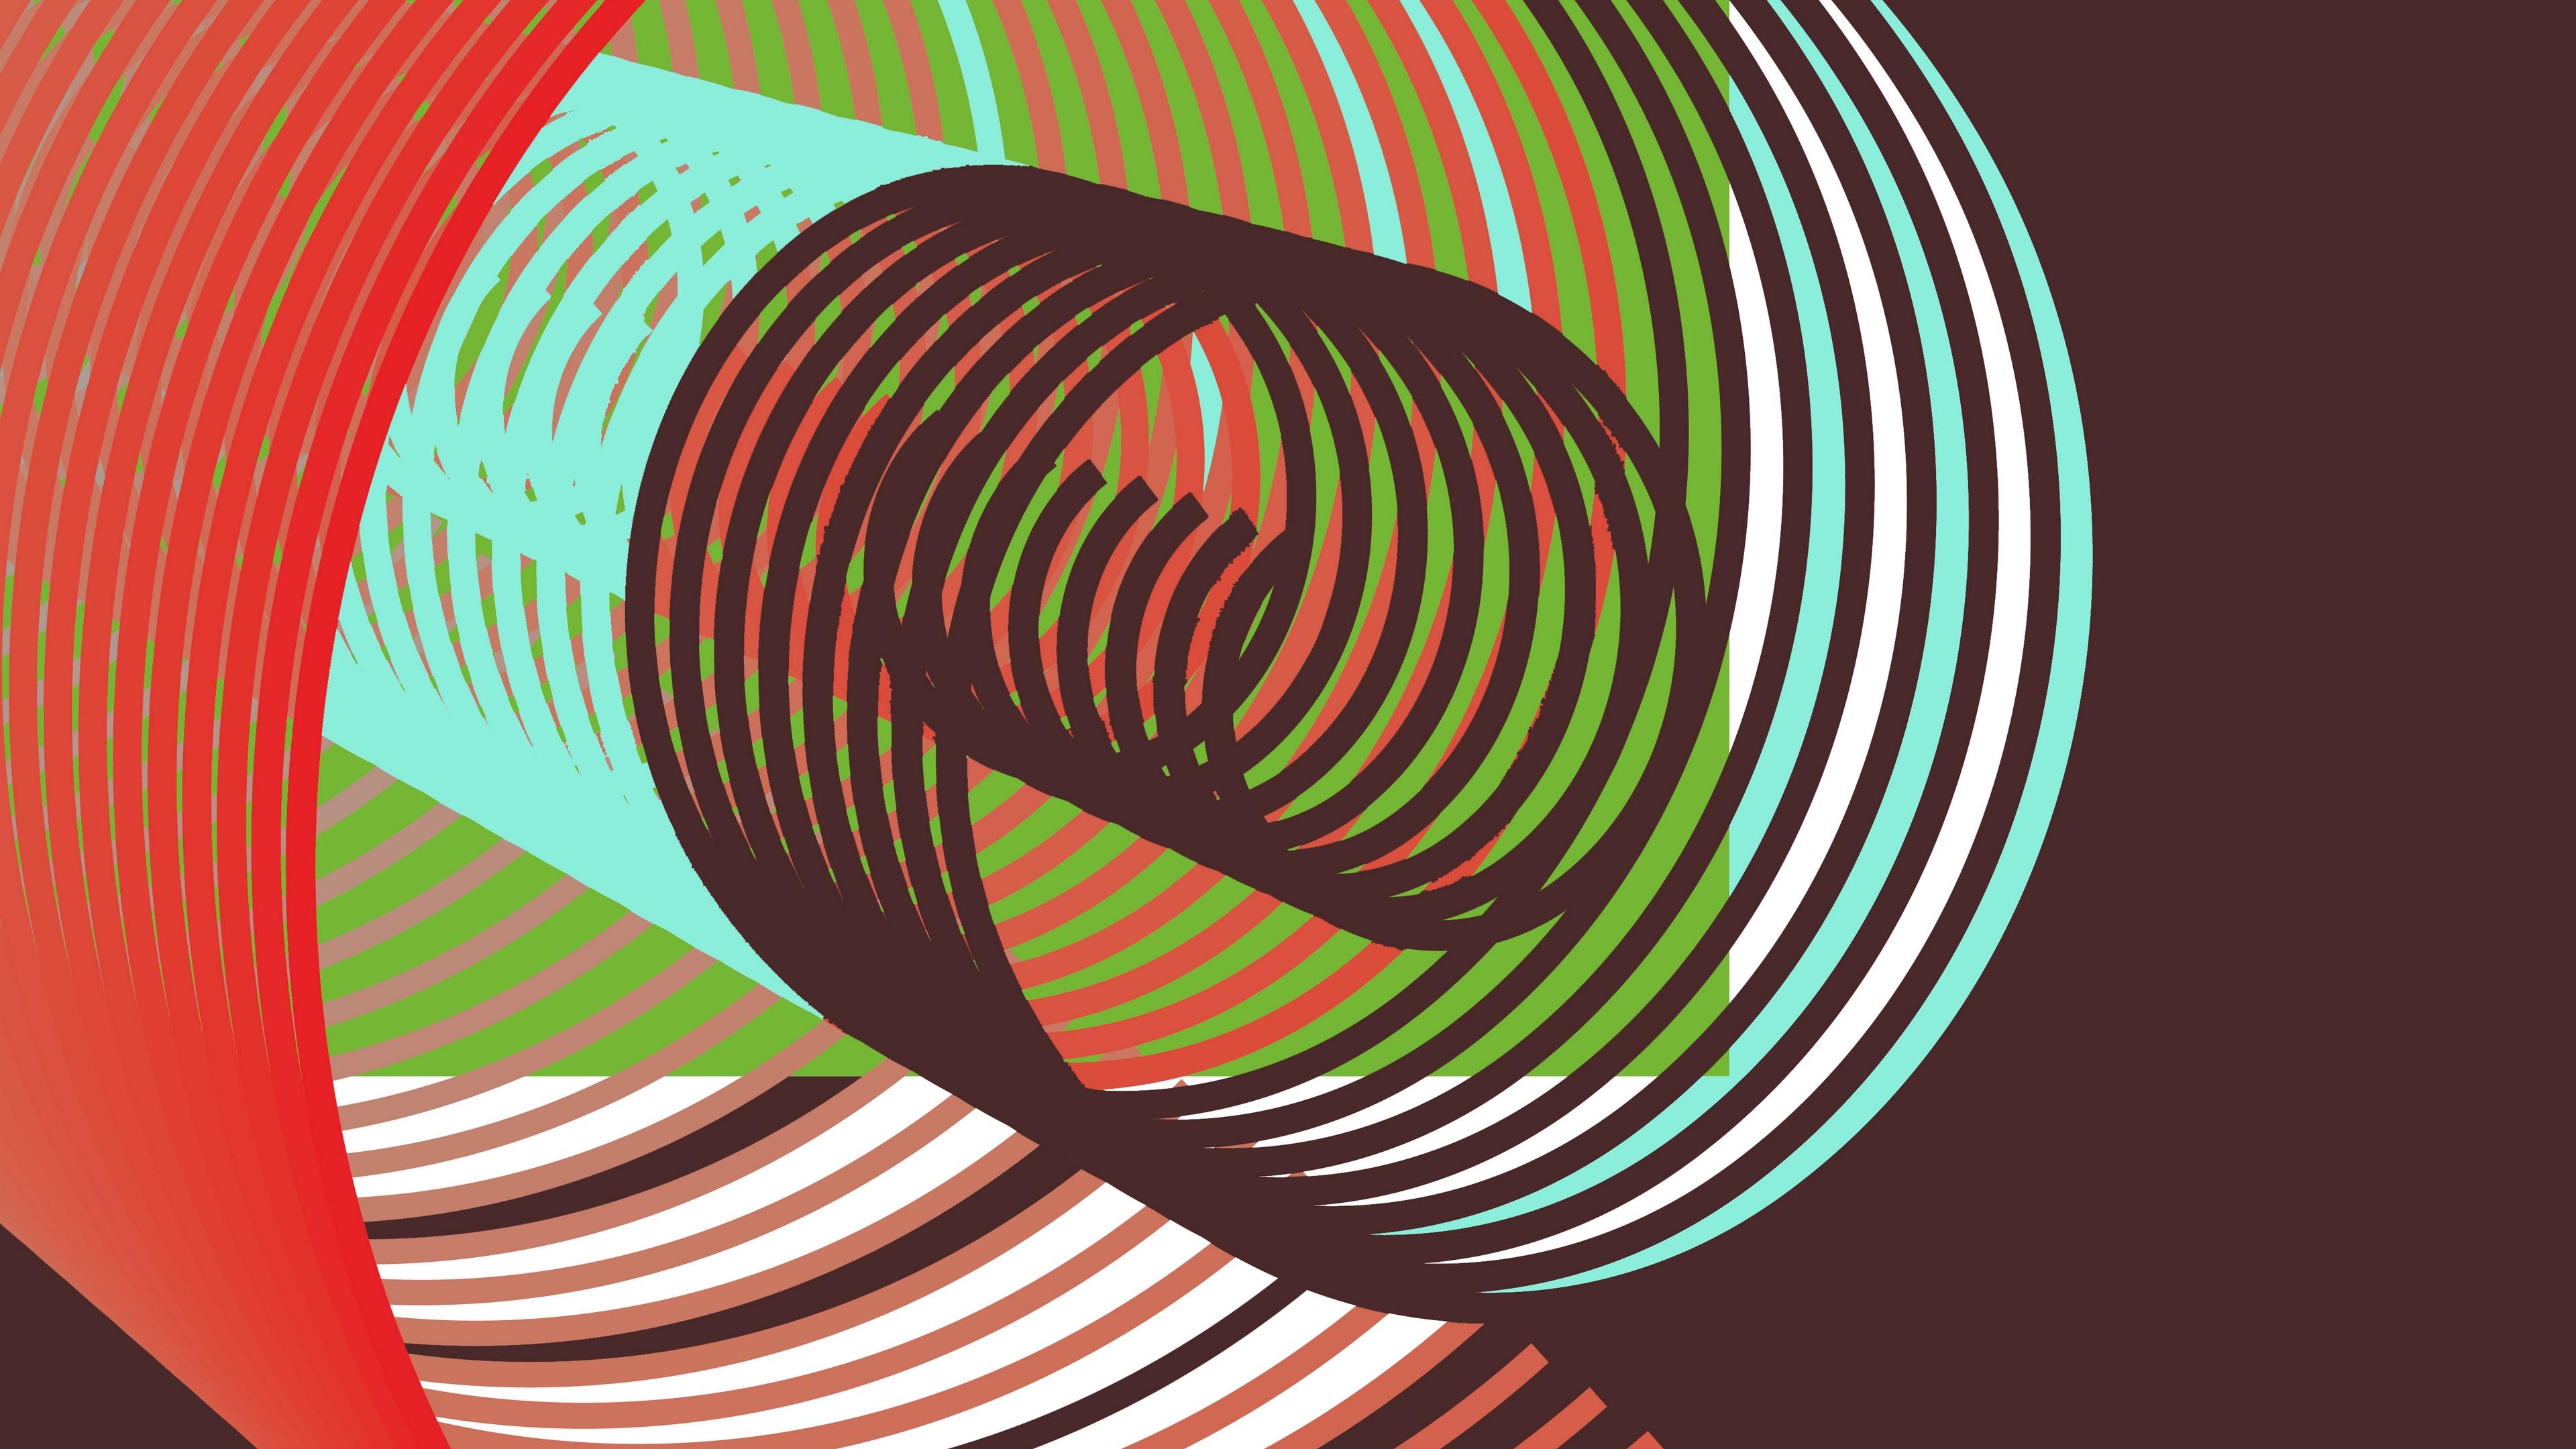 line rotation illusion colorful 4k 1539370439 - line, rotation, illusion, colorful 4k - rotation, Line, Illusion